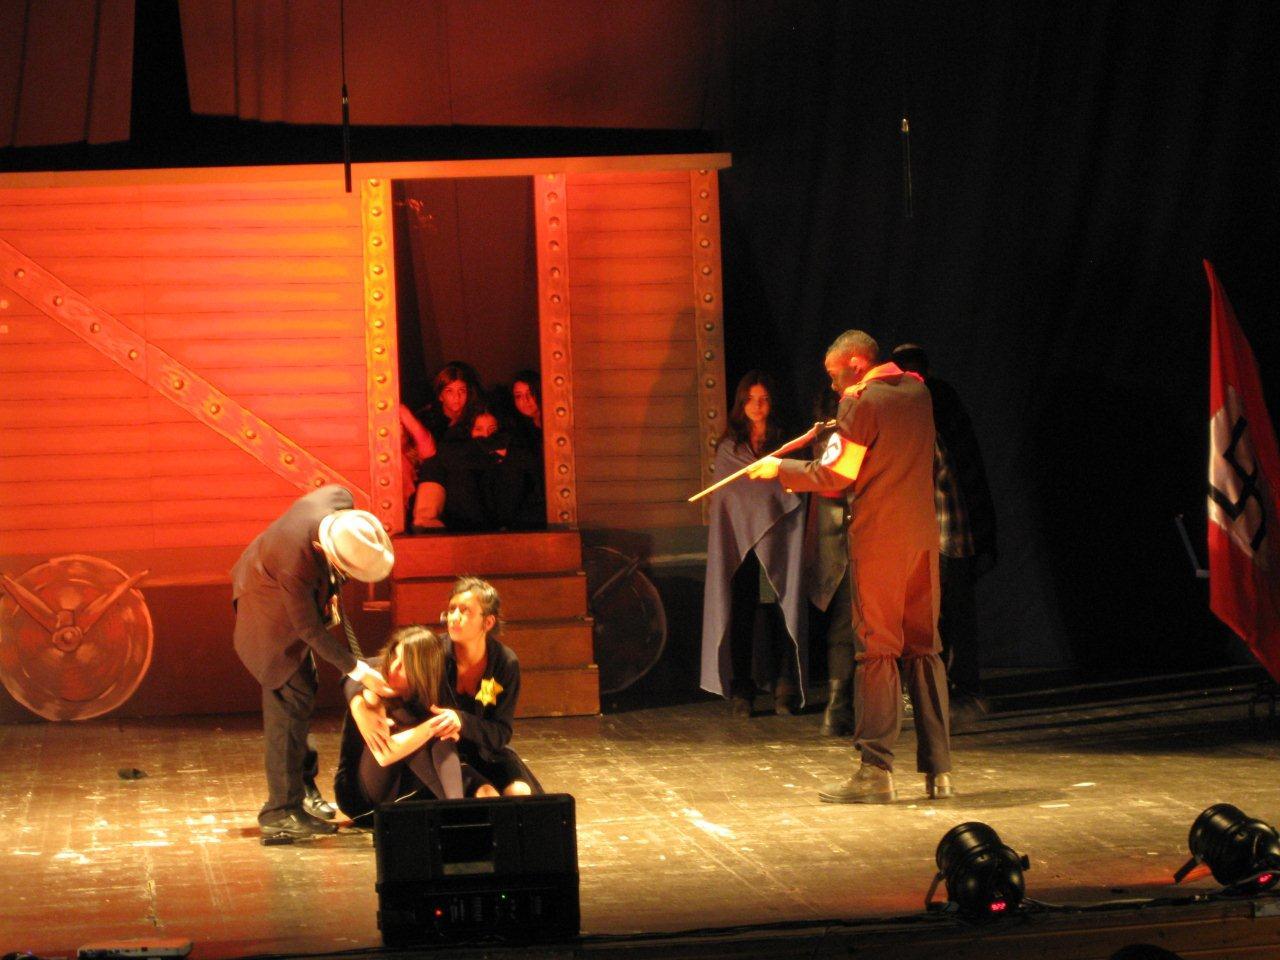 Obra de teatro for La cocina obra de teatro